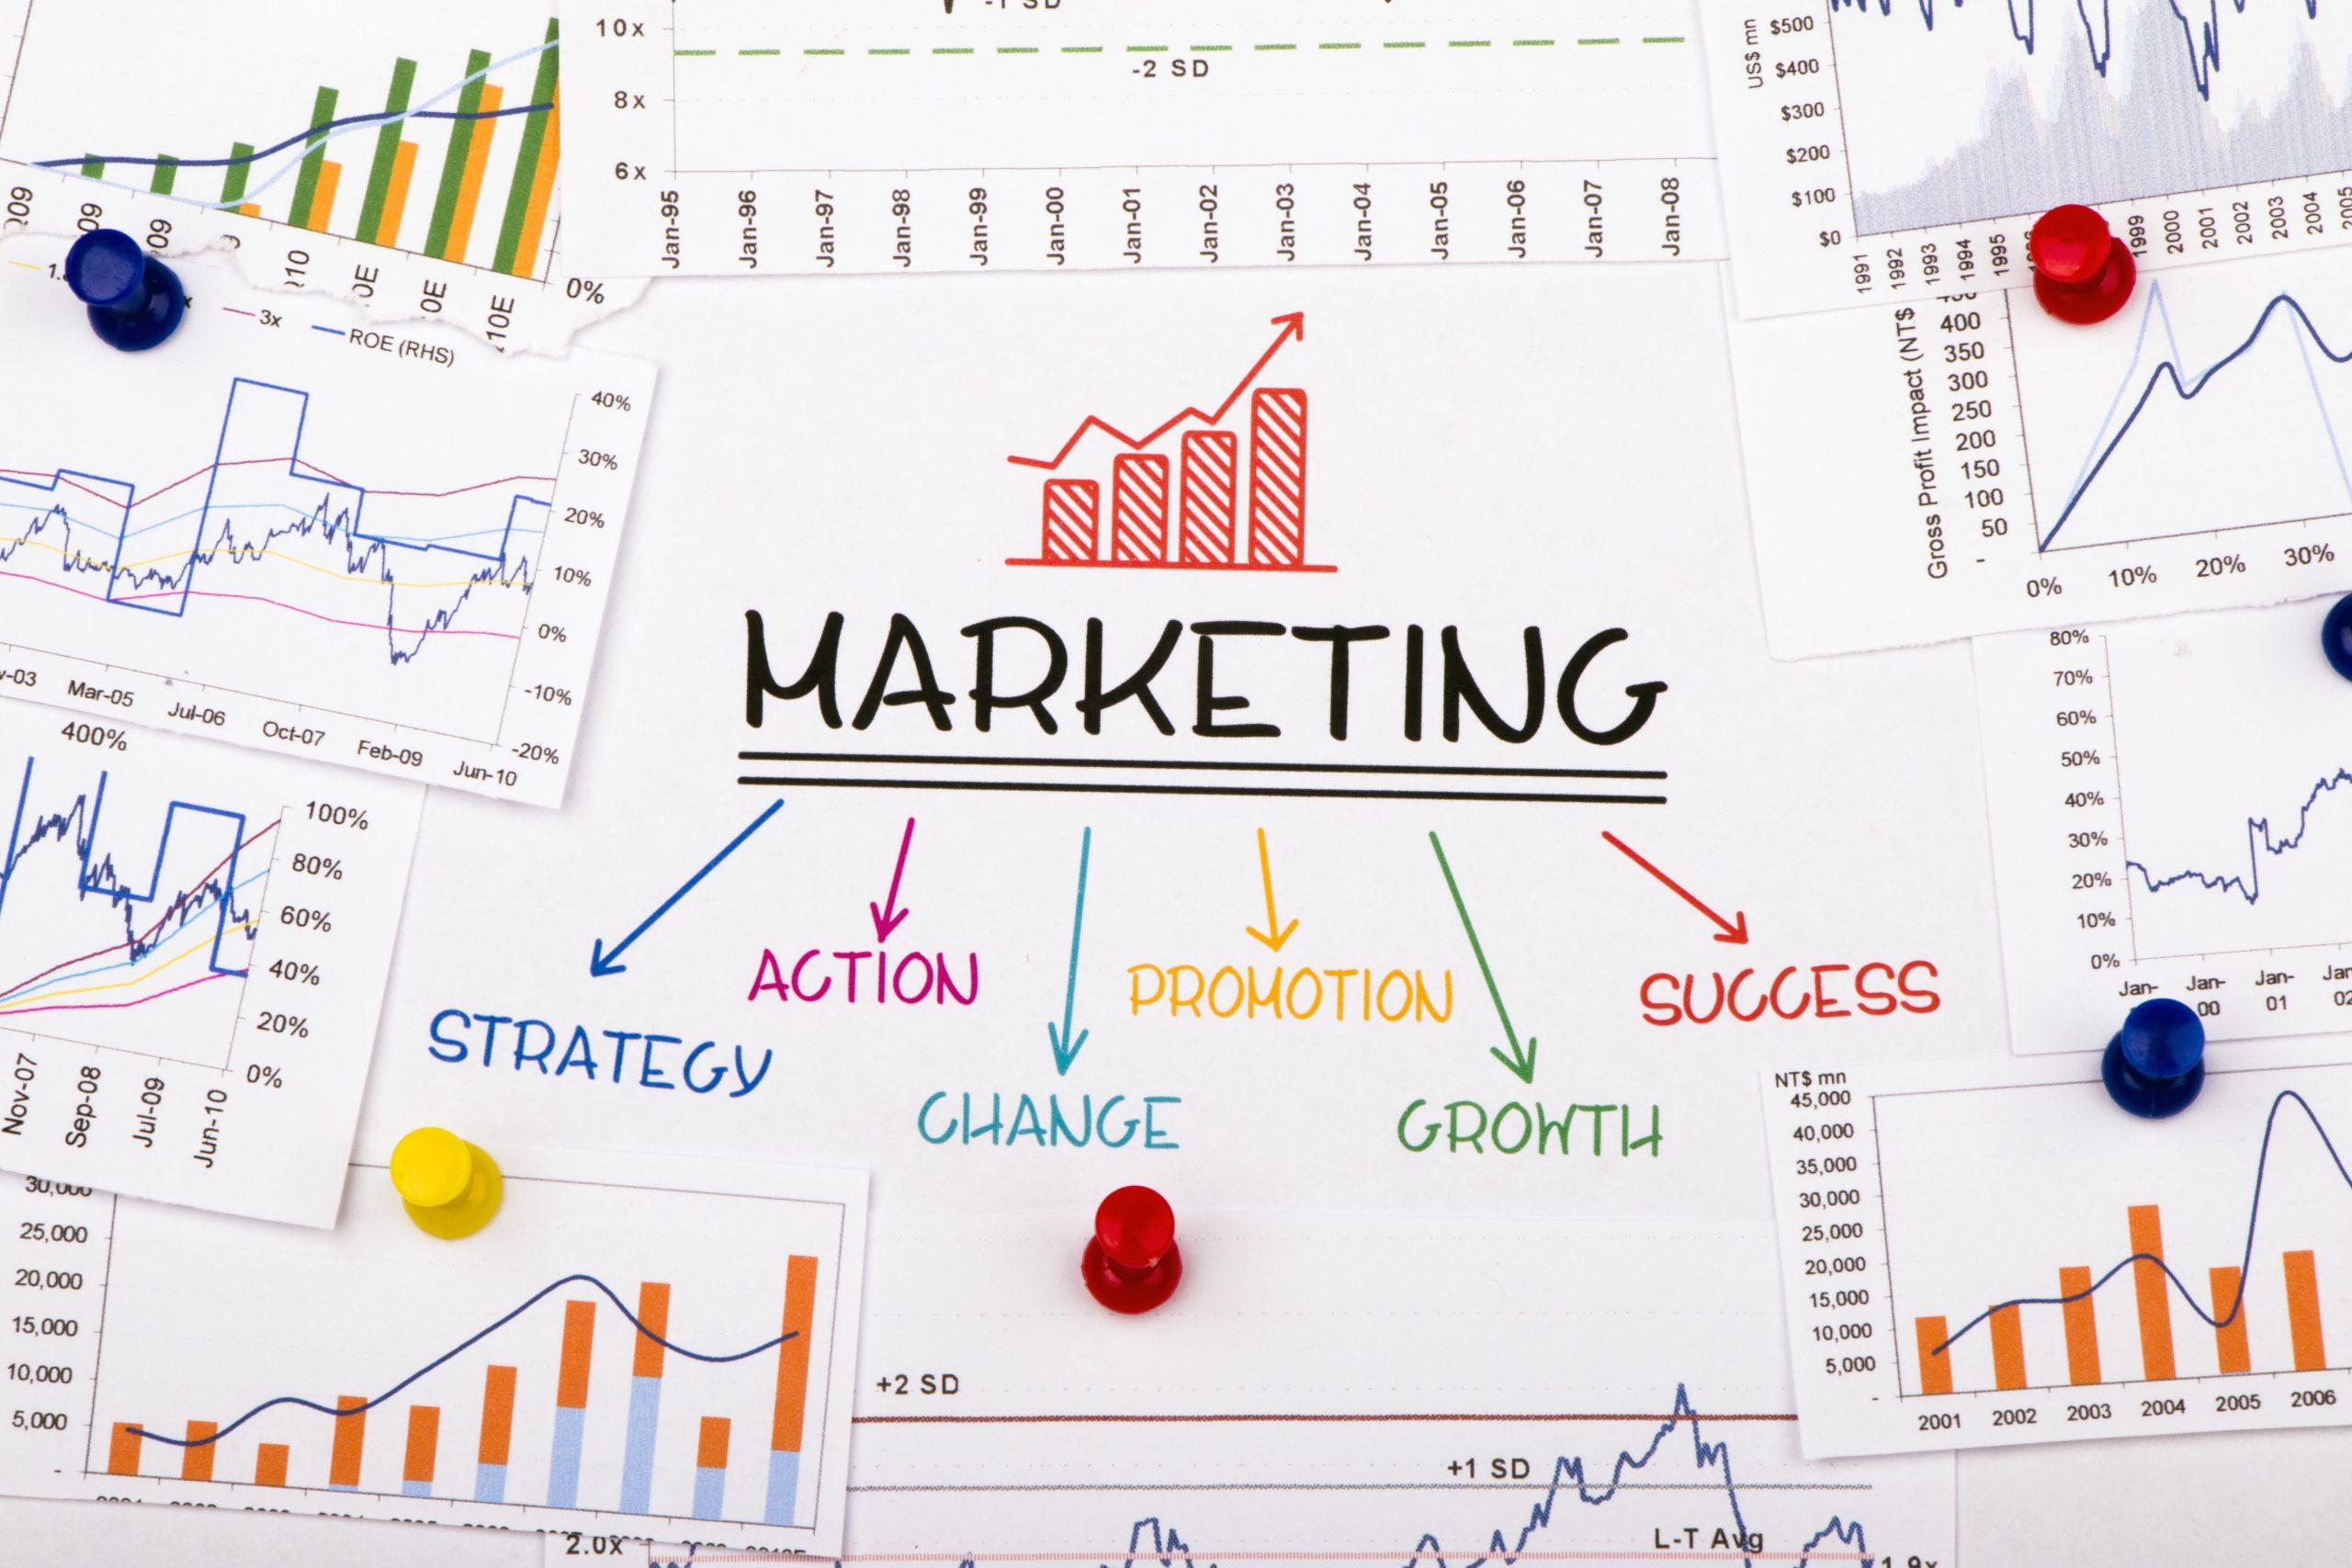 marketing strategy, marketing plan, marketing auditing